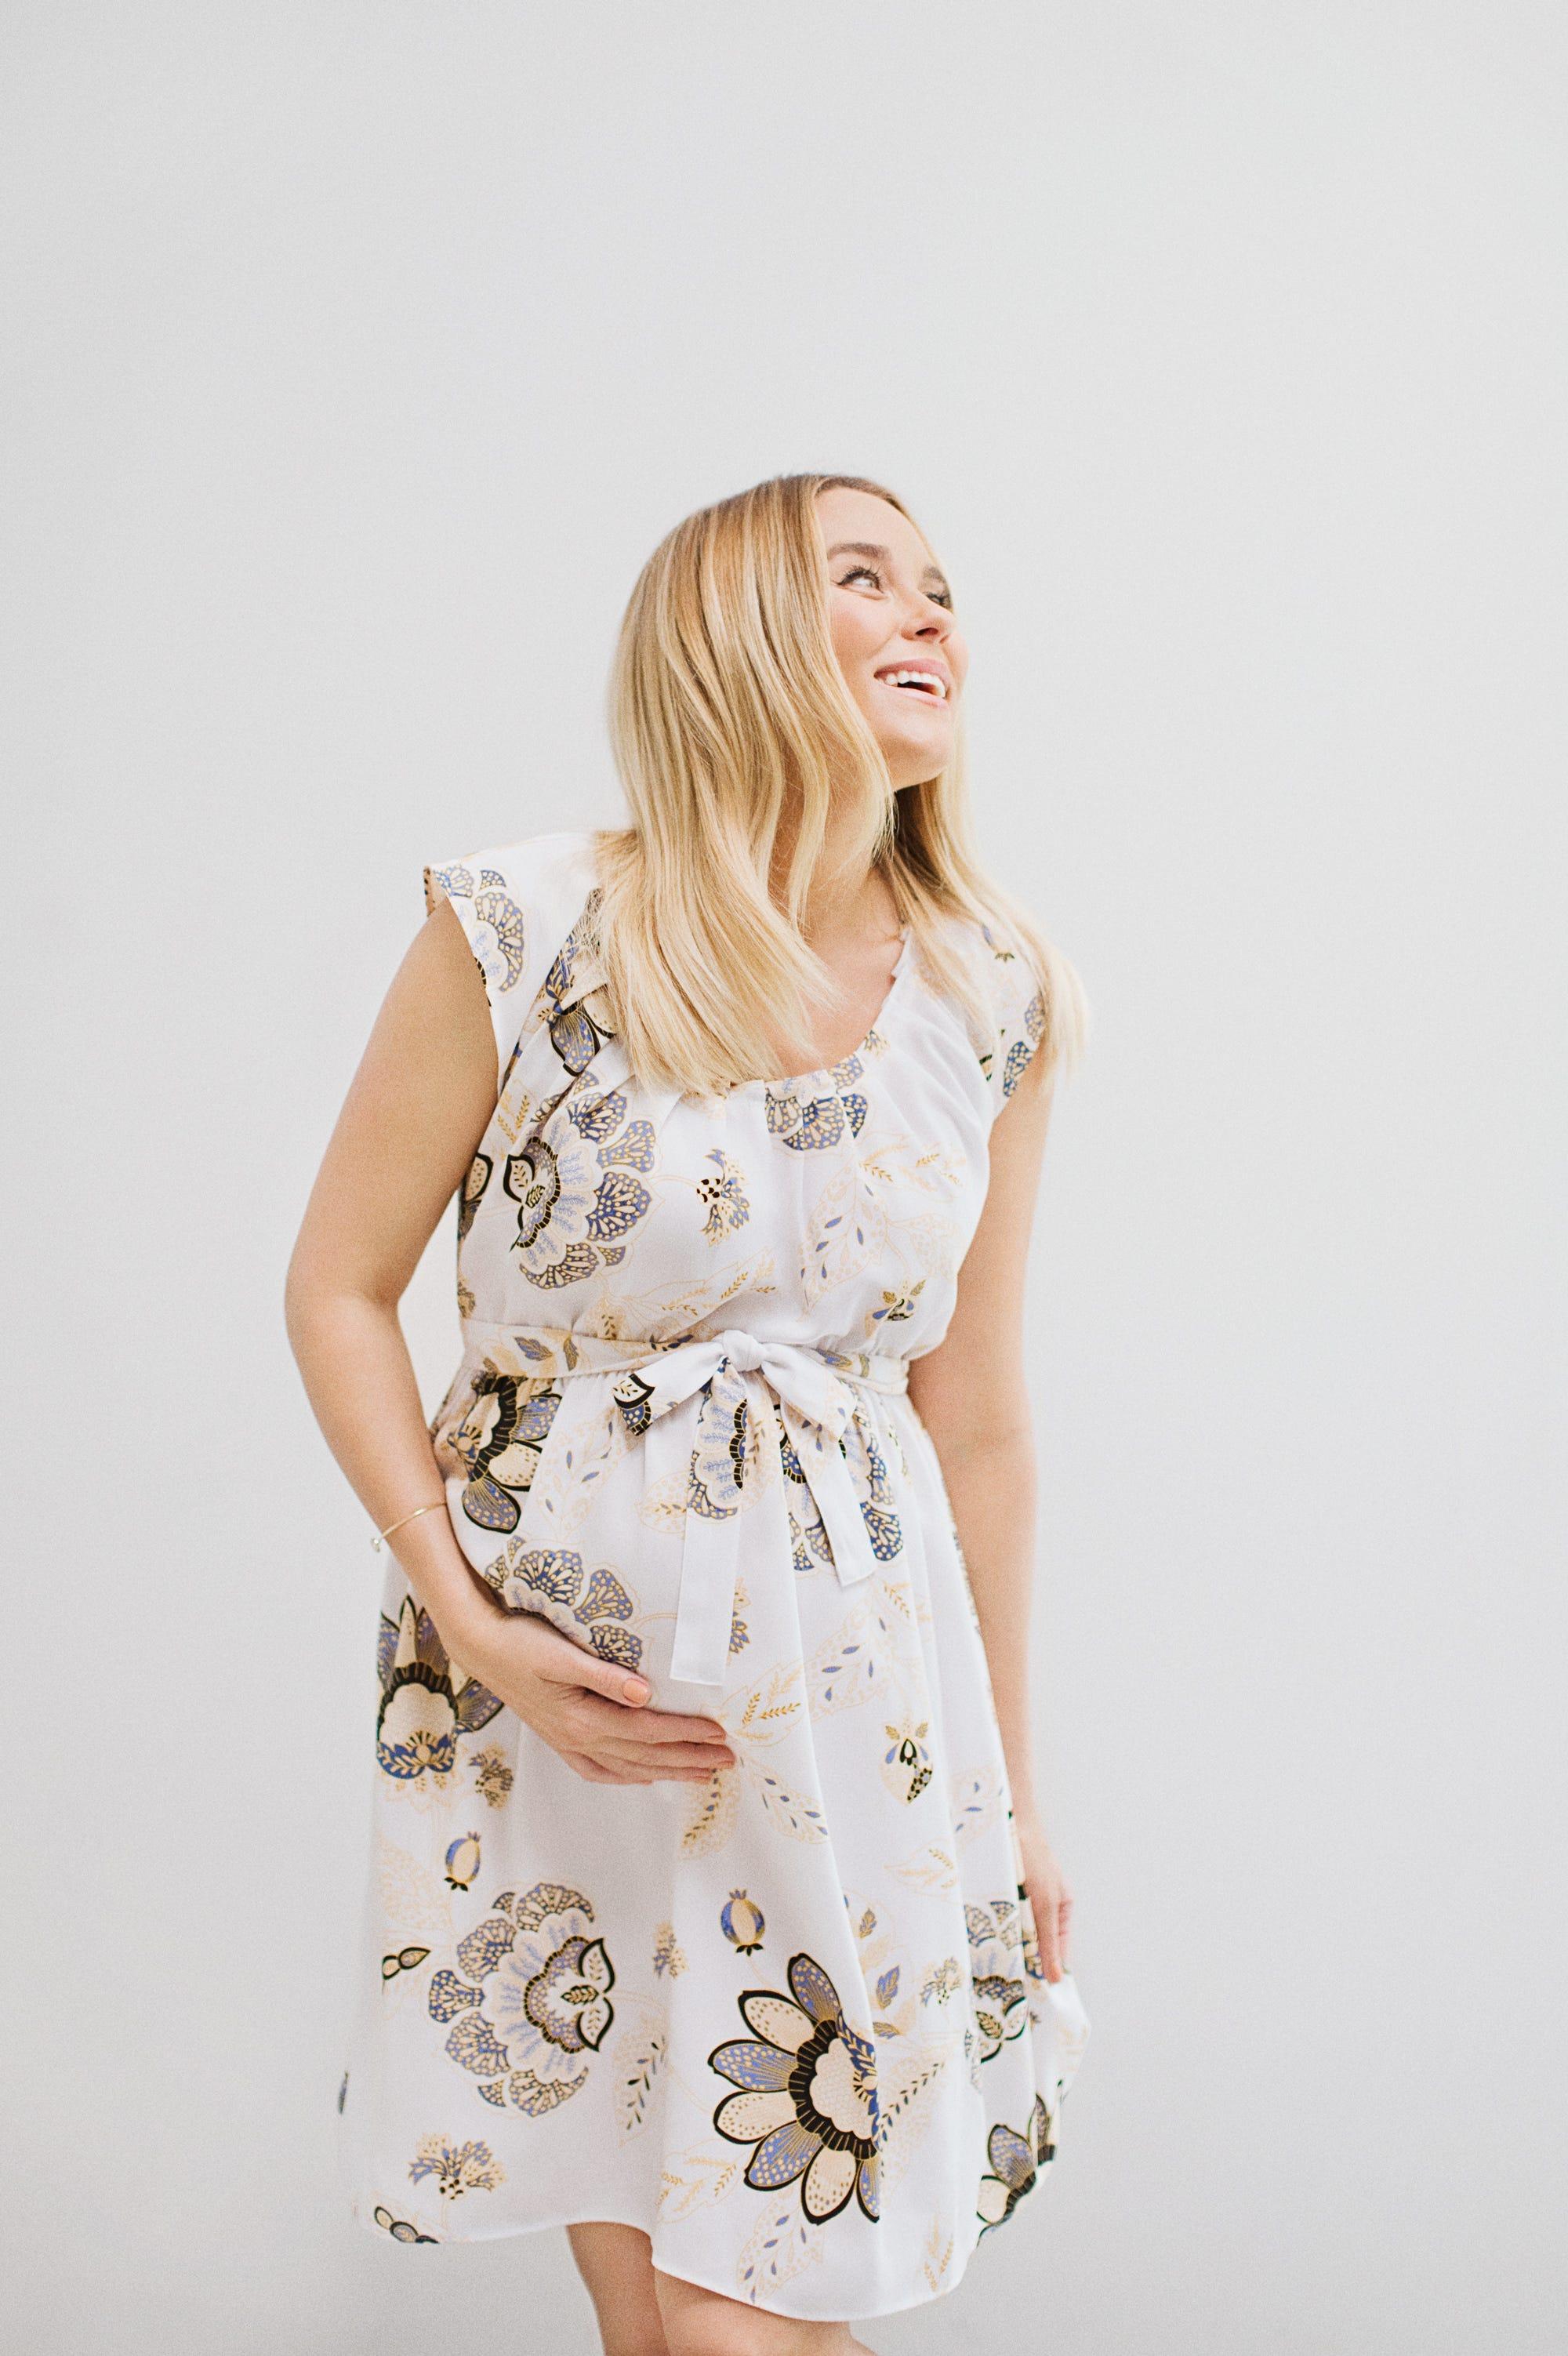 Lauren Conrad Pregnant Kohls Maternity Clothing Line Lc